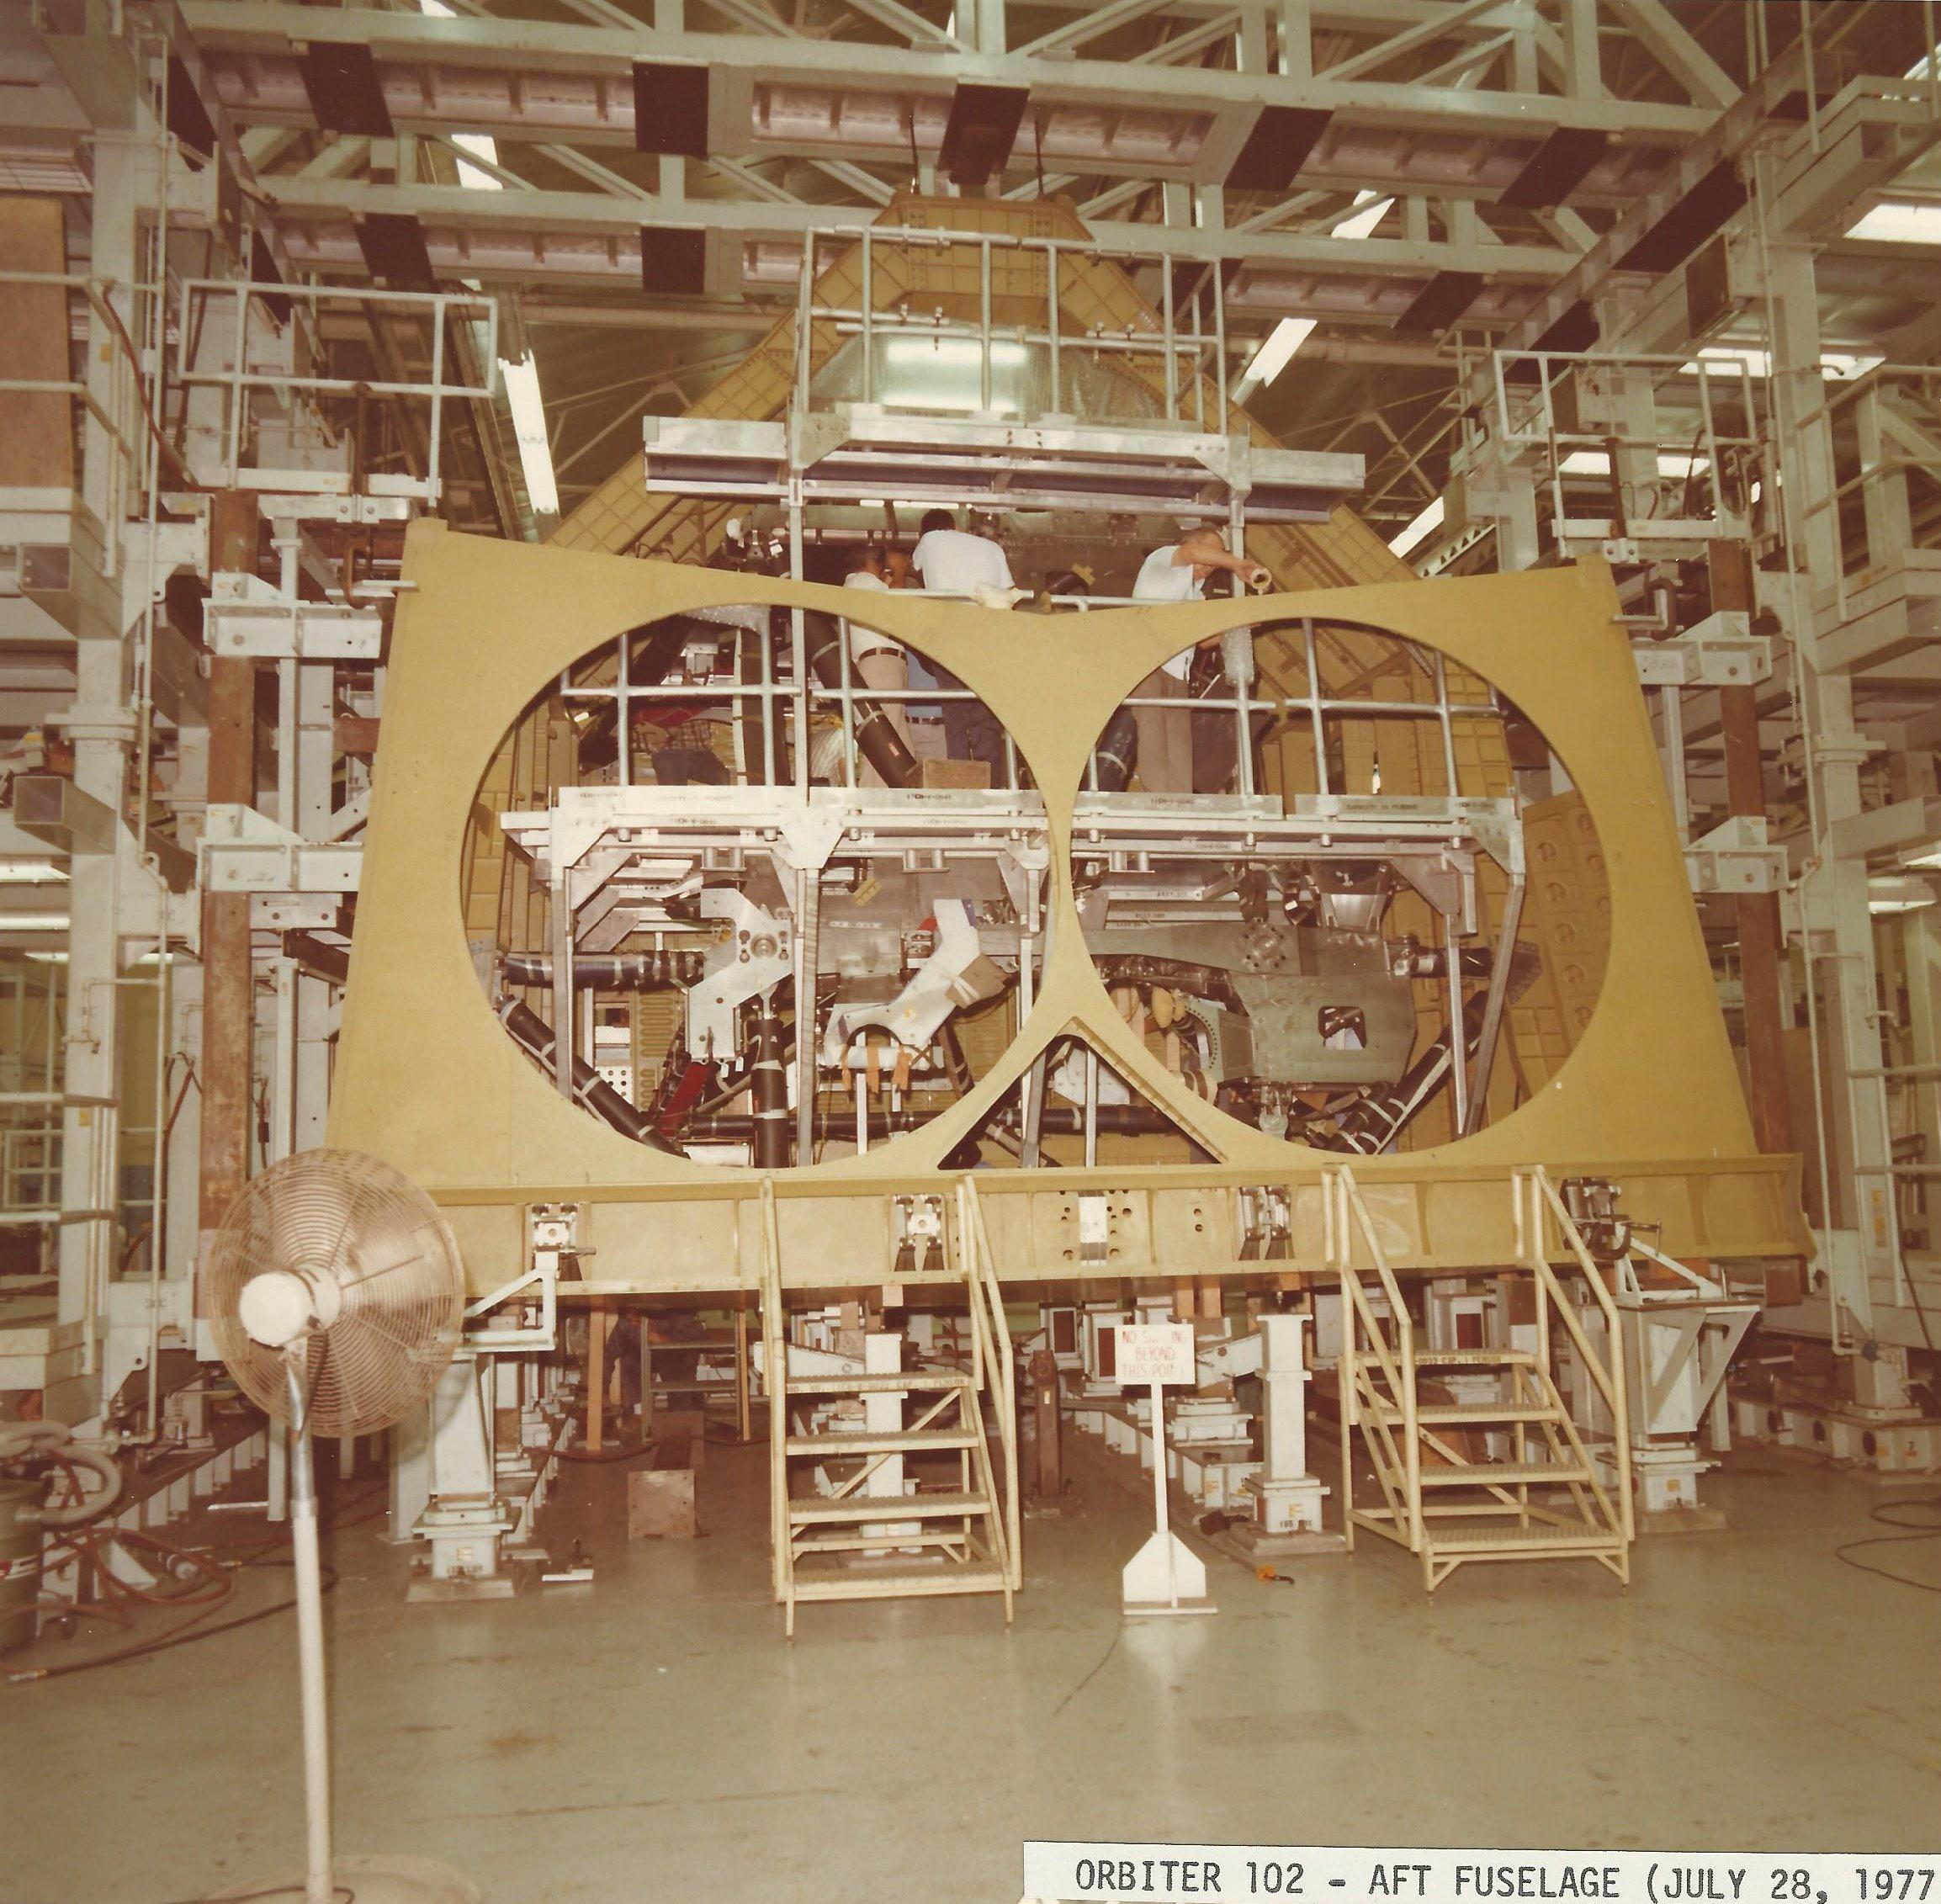 Orbiter 102 Crew Module April 1977 sub-system development a Dow 1.jpg